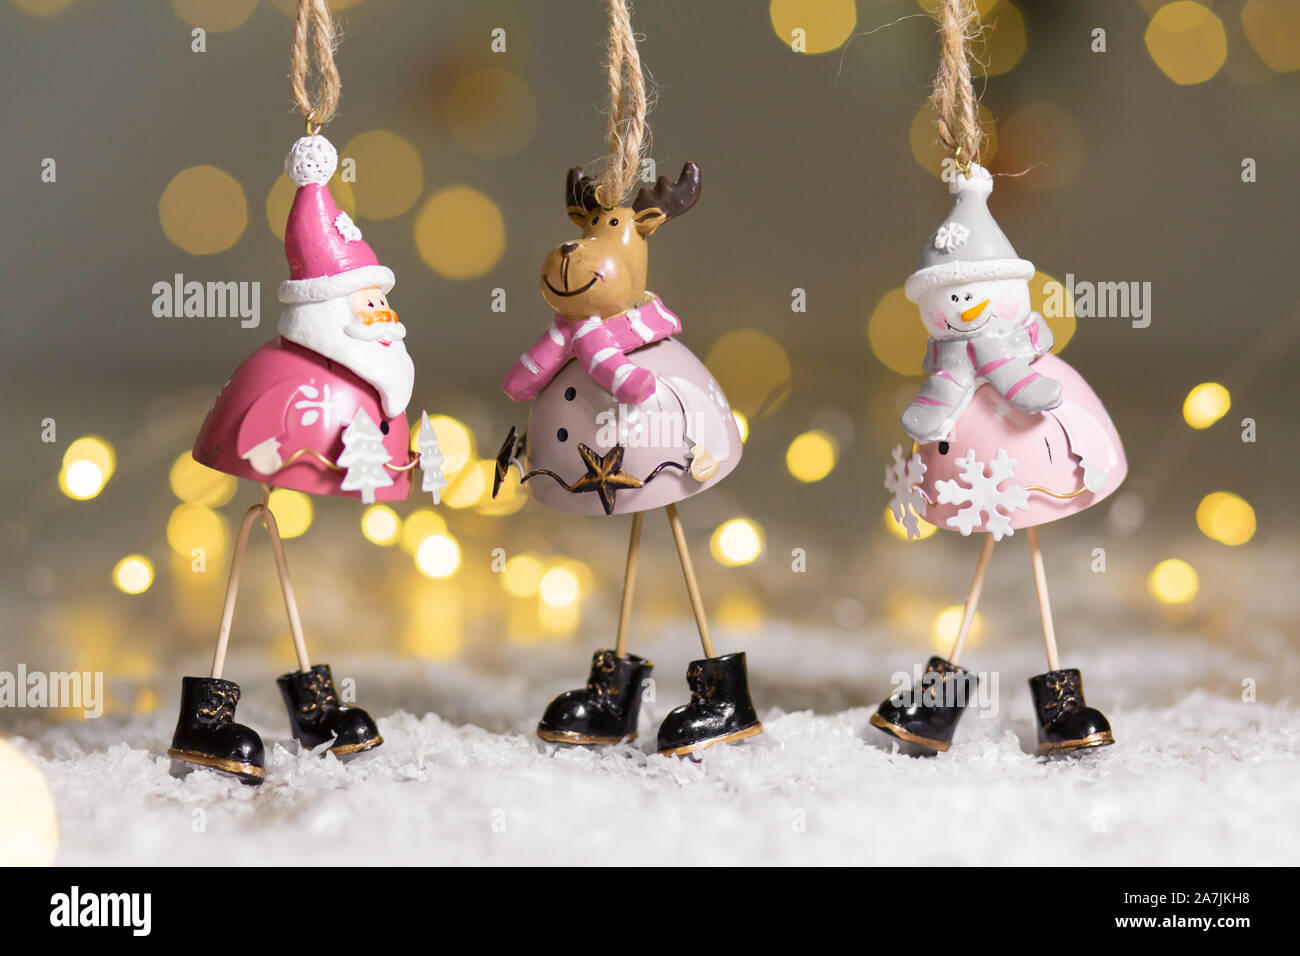 Decorative Figurines Of A Christmas Theme Set Of Statuettes Of Santa Snowman And Deer Christmas Tree Decoration Festive Decor Warm Bokeh Lights Stock Photo Alamy